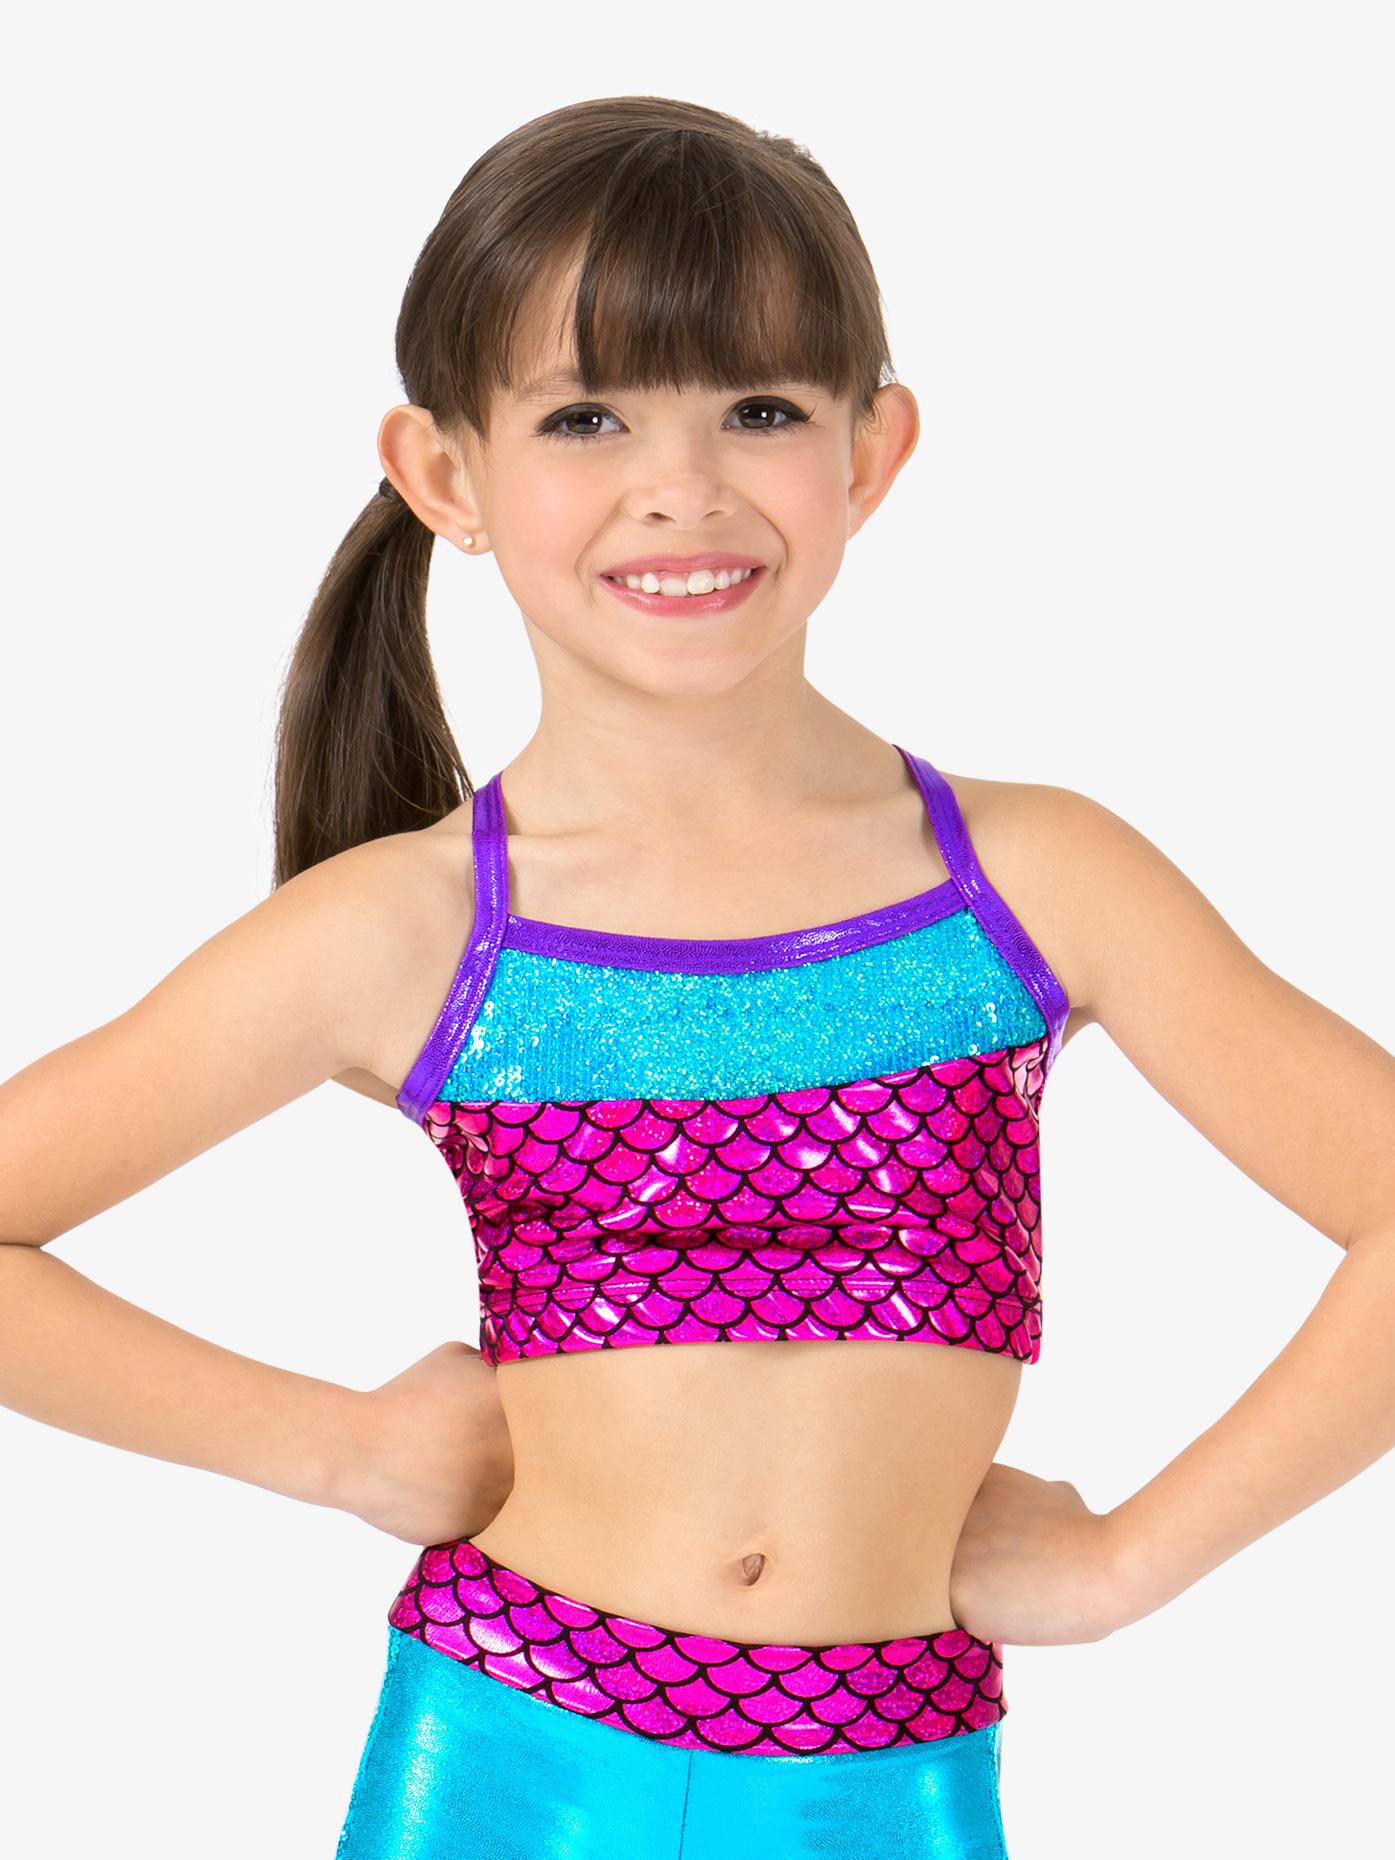 Reflectionz Girls Mermaid Sequins Metallic Camisole Dance Bra Top TA4825